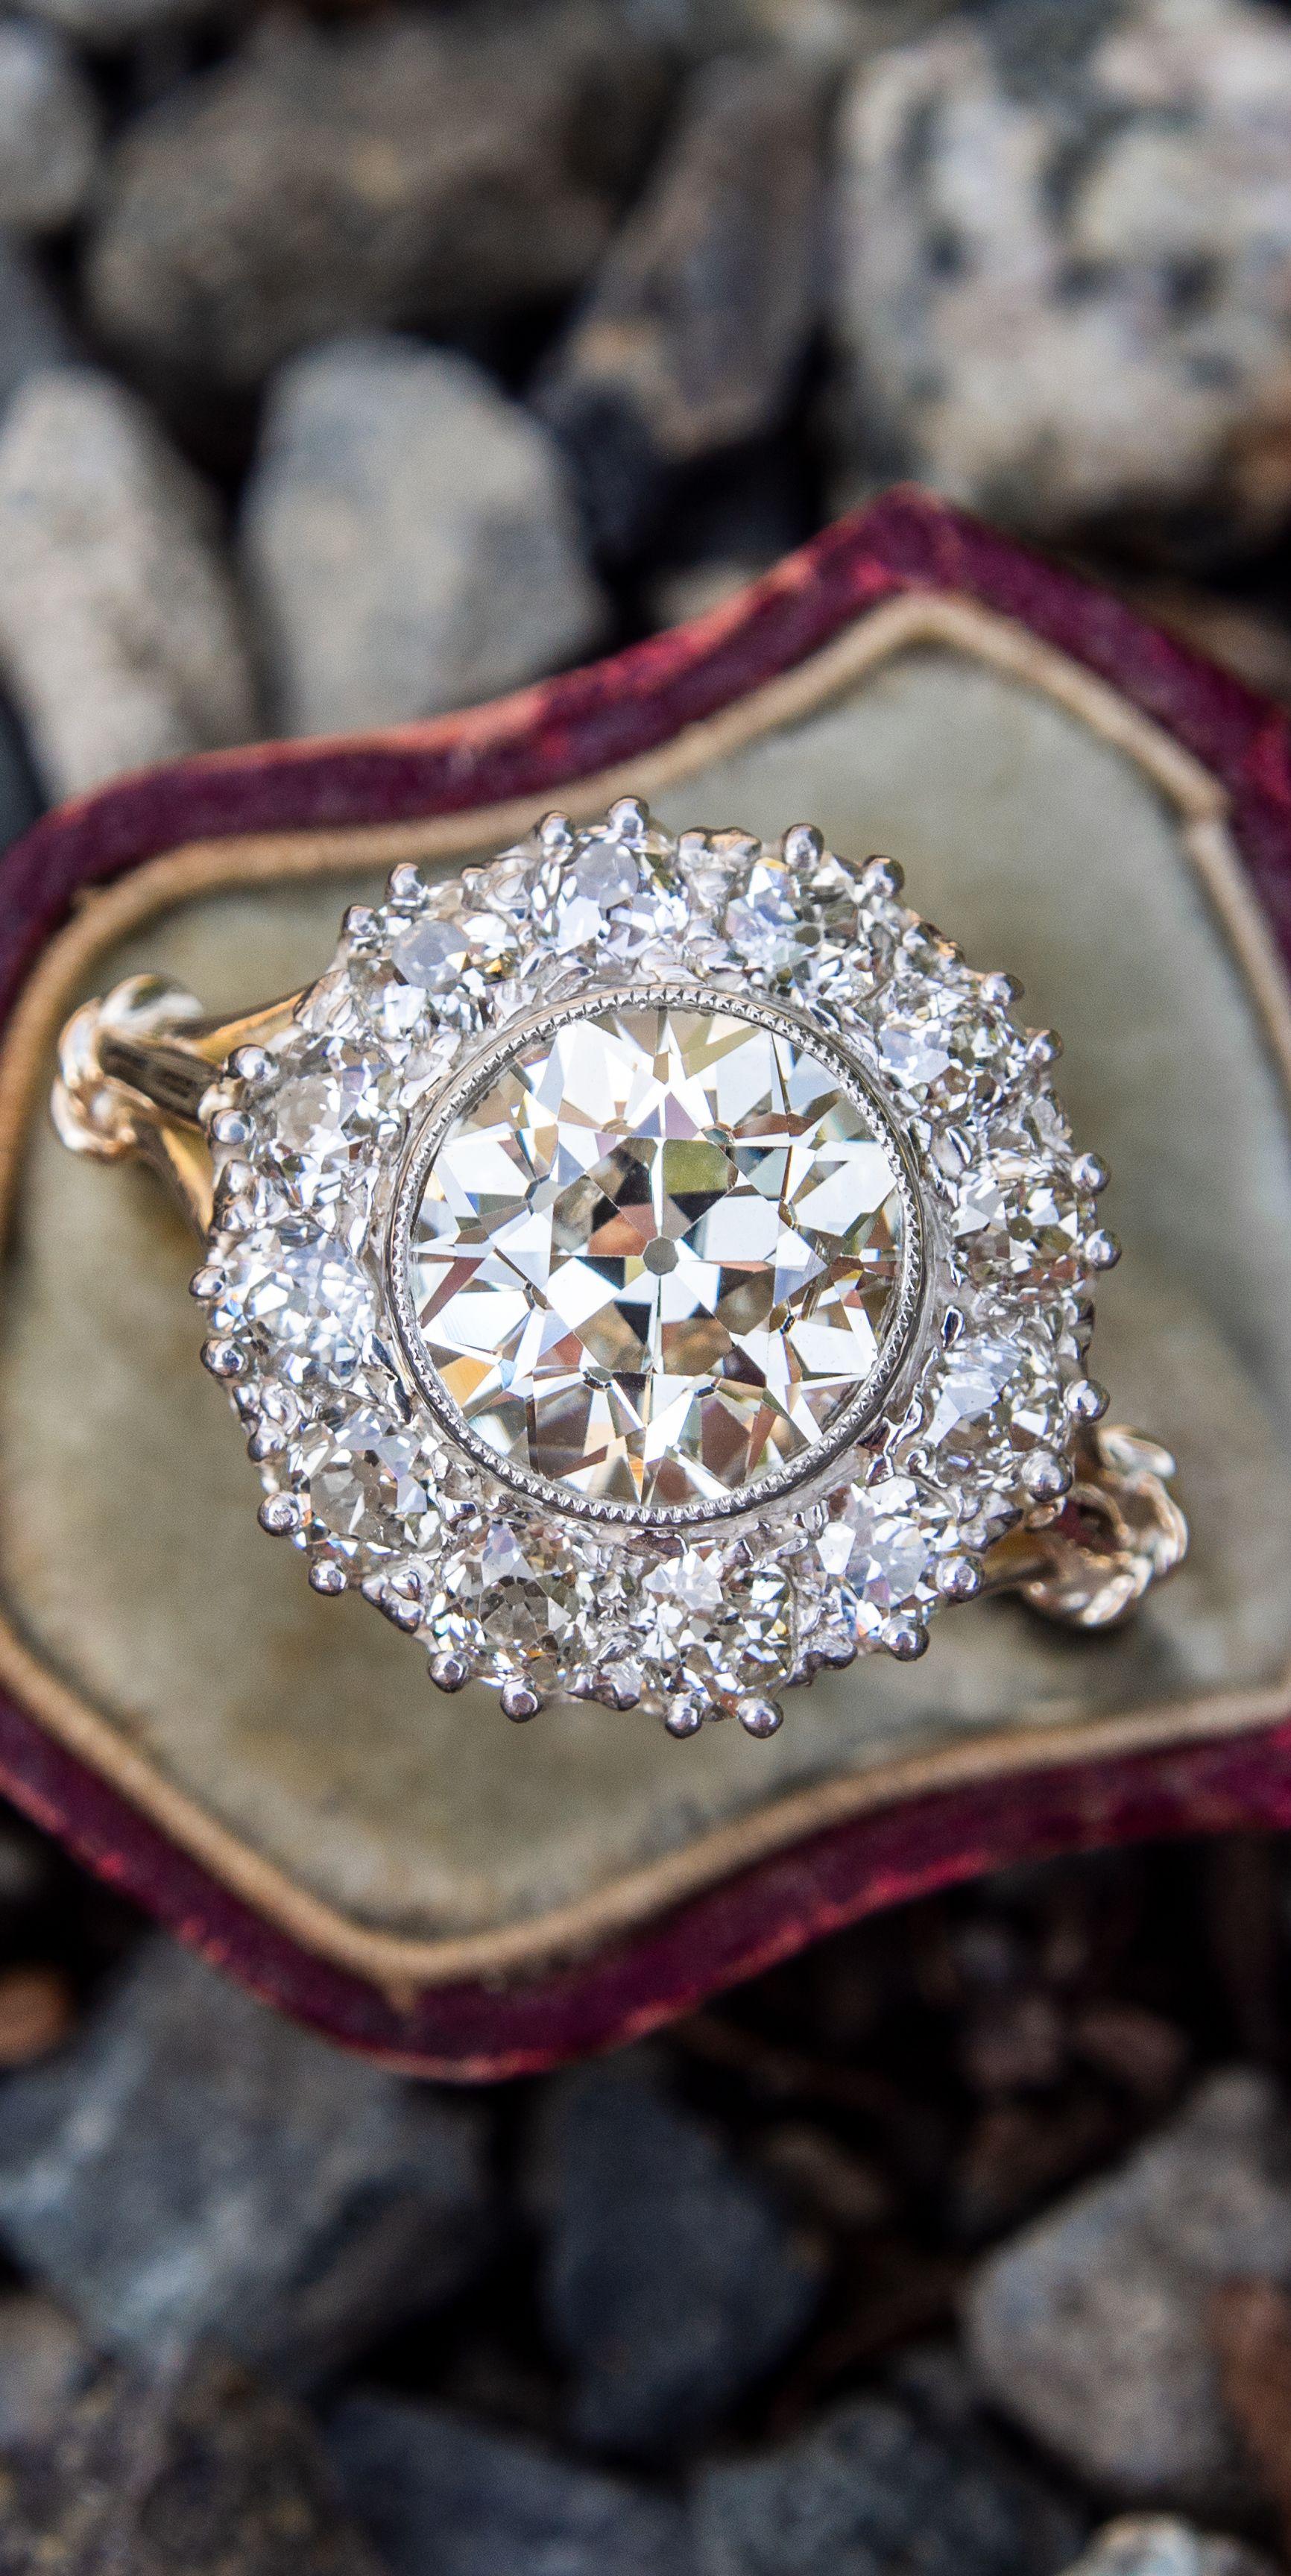 Vintage Victorian Design Rose Cut Diamond Ring Handmade Jewelry 925 Sterling Silver Ring Fine Quality Diamond